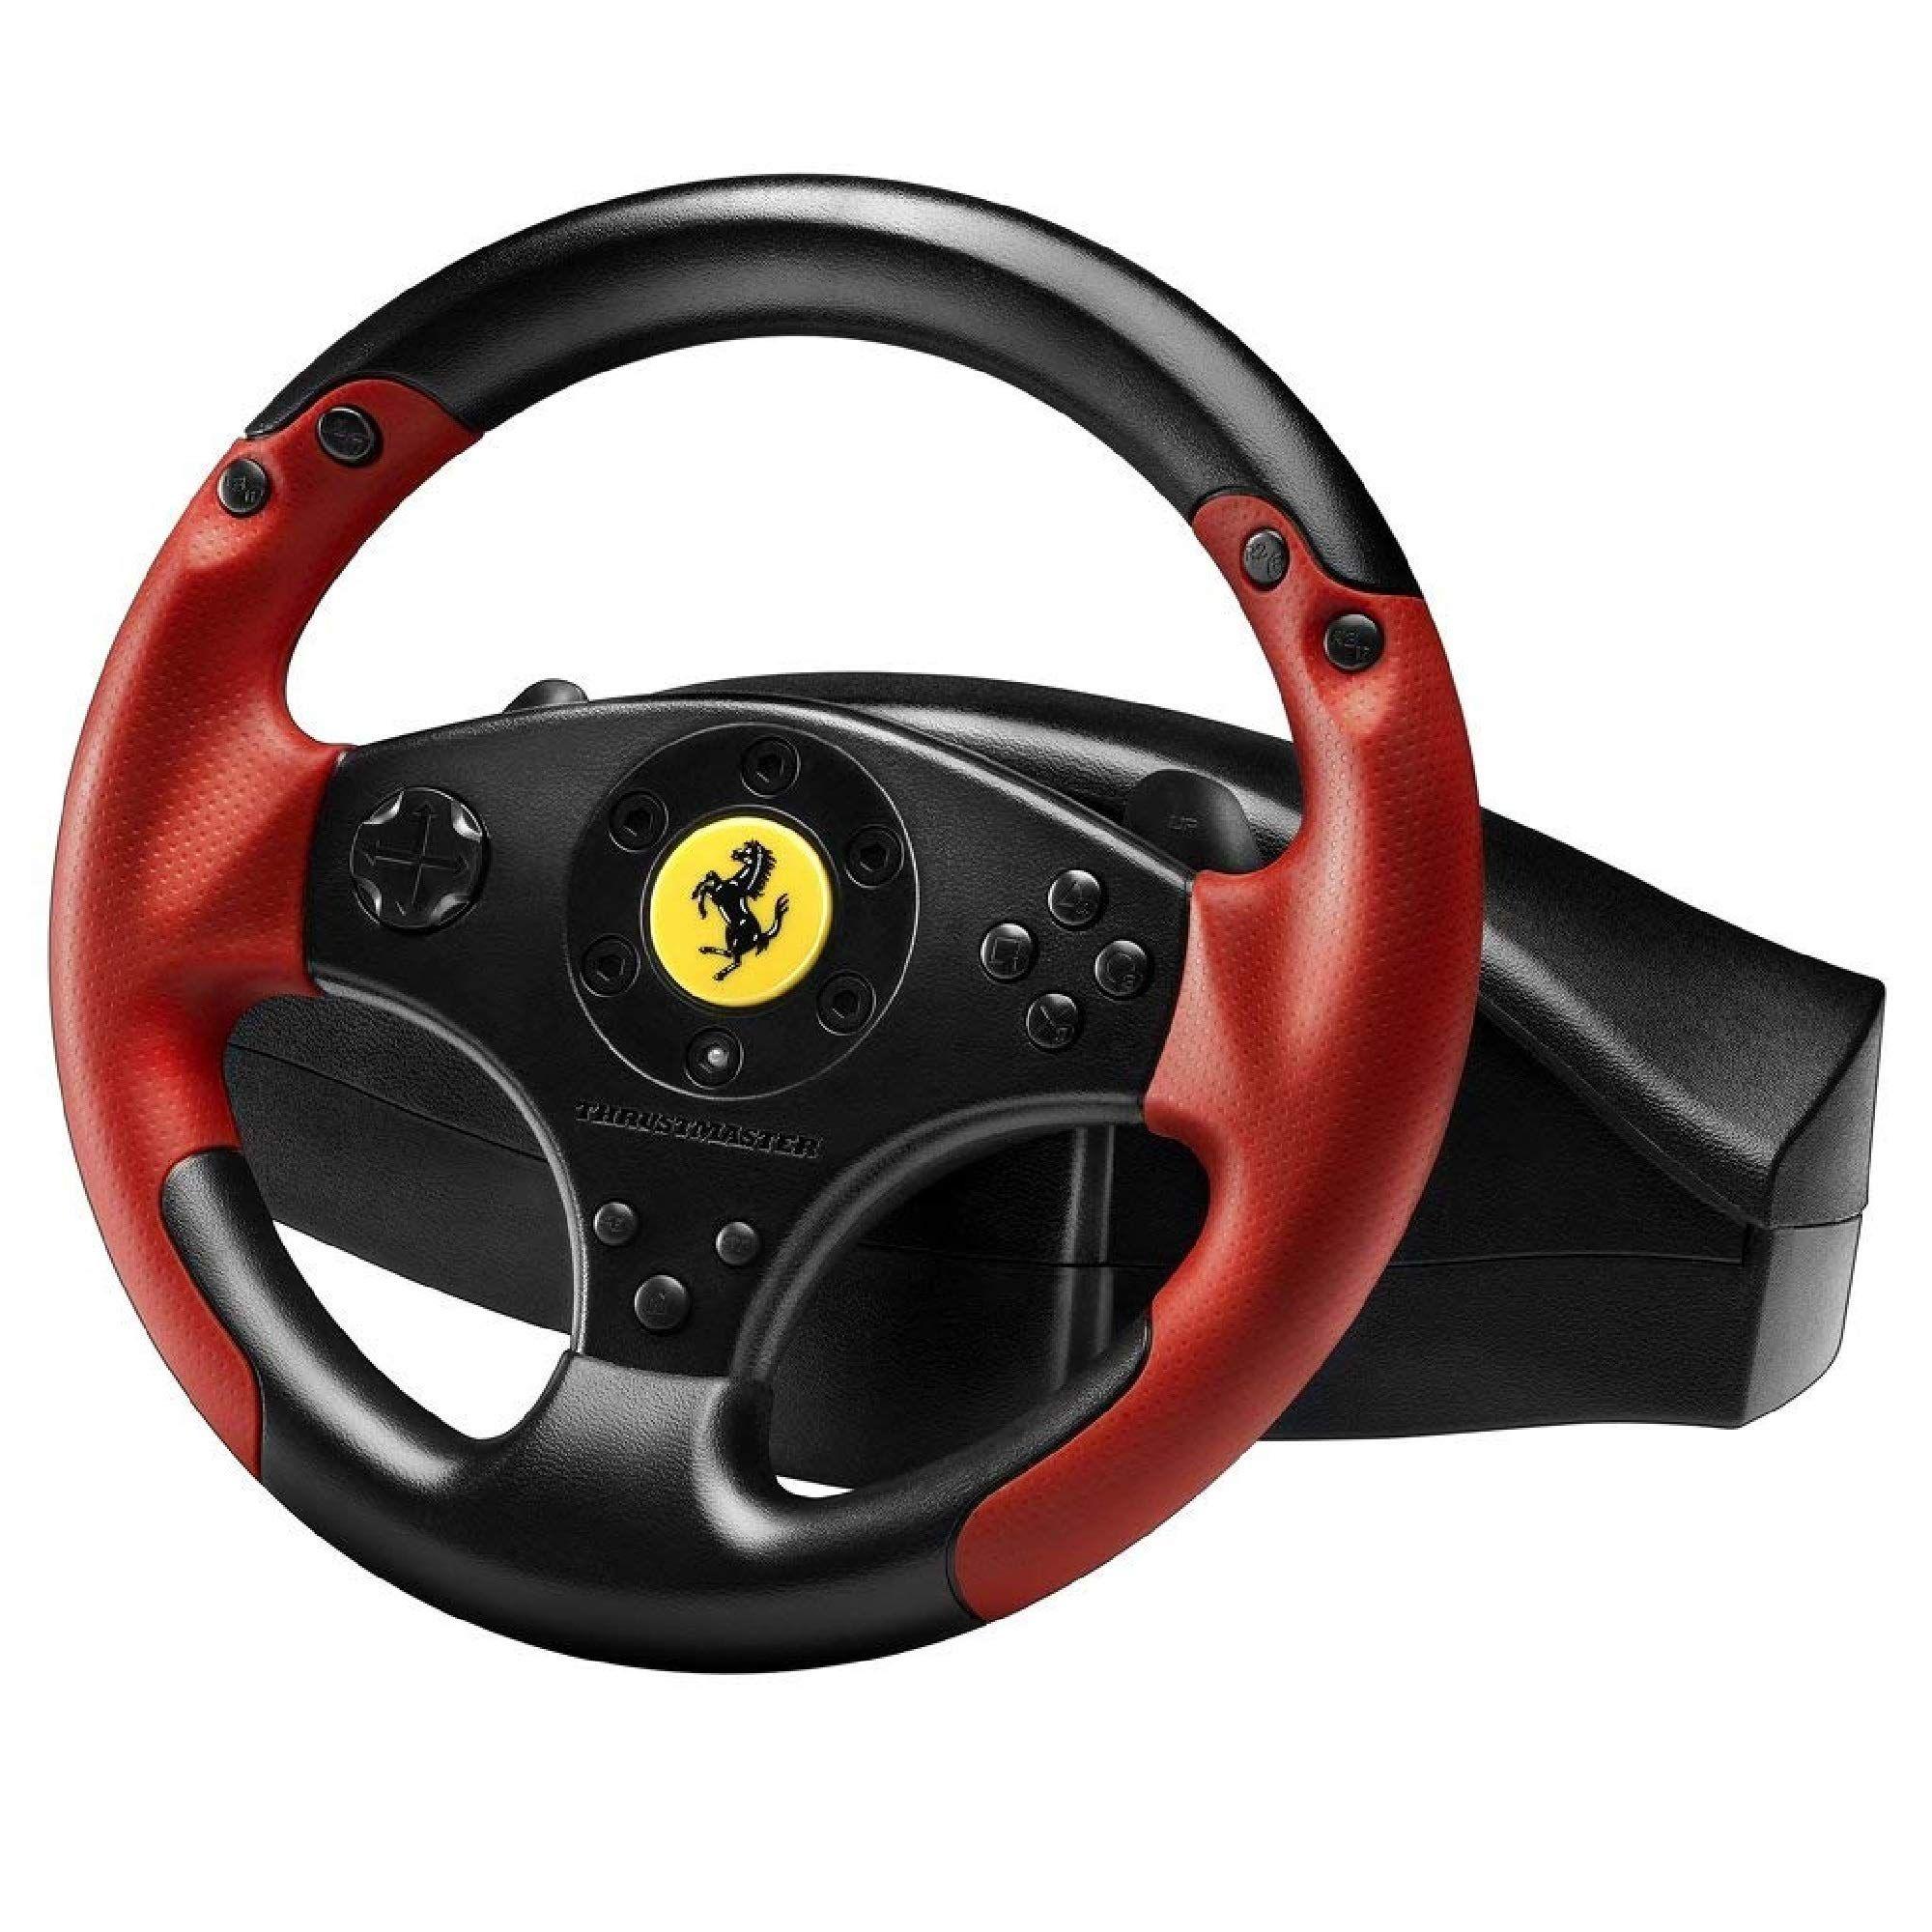 Thrustmaster Ferrari Racing Wheel Red Legend Edition (PC